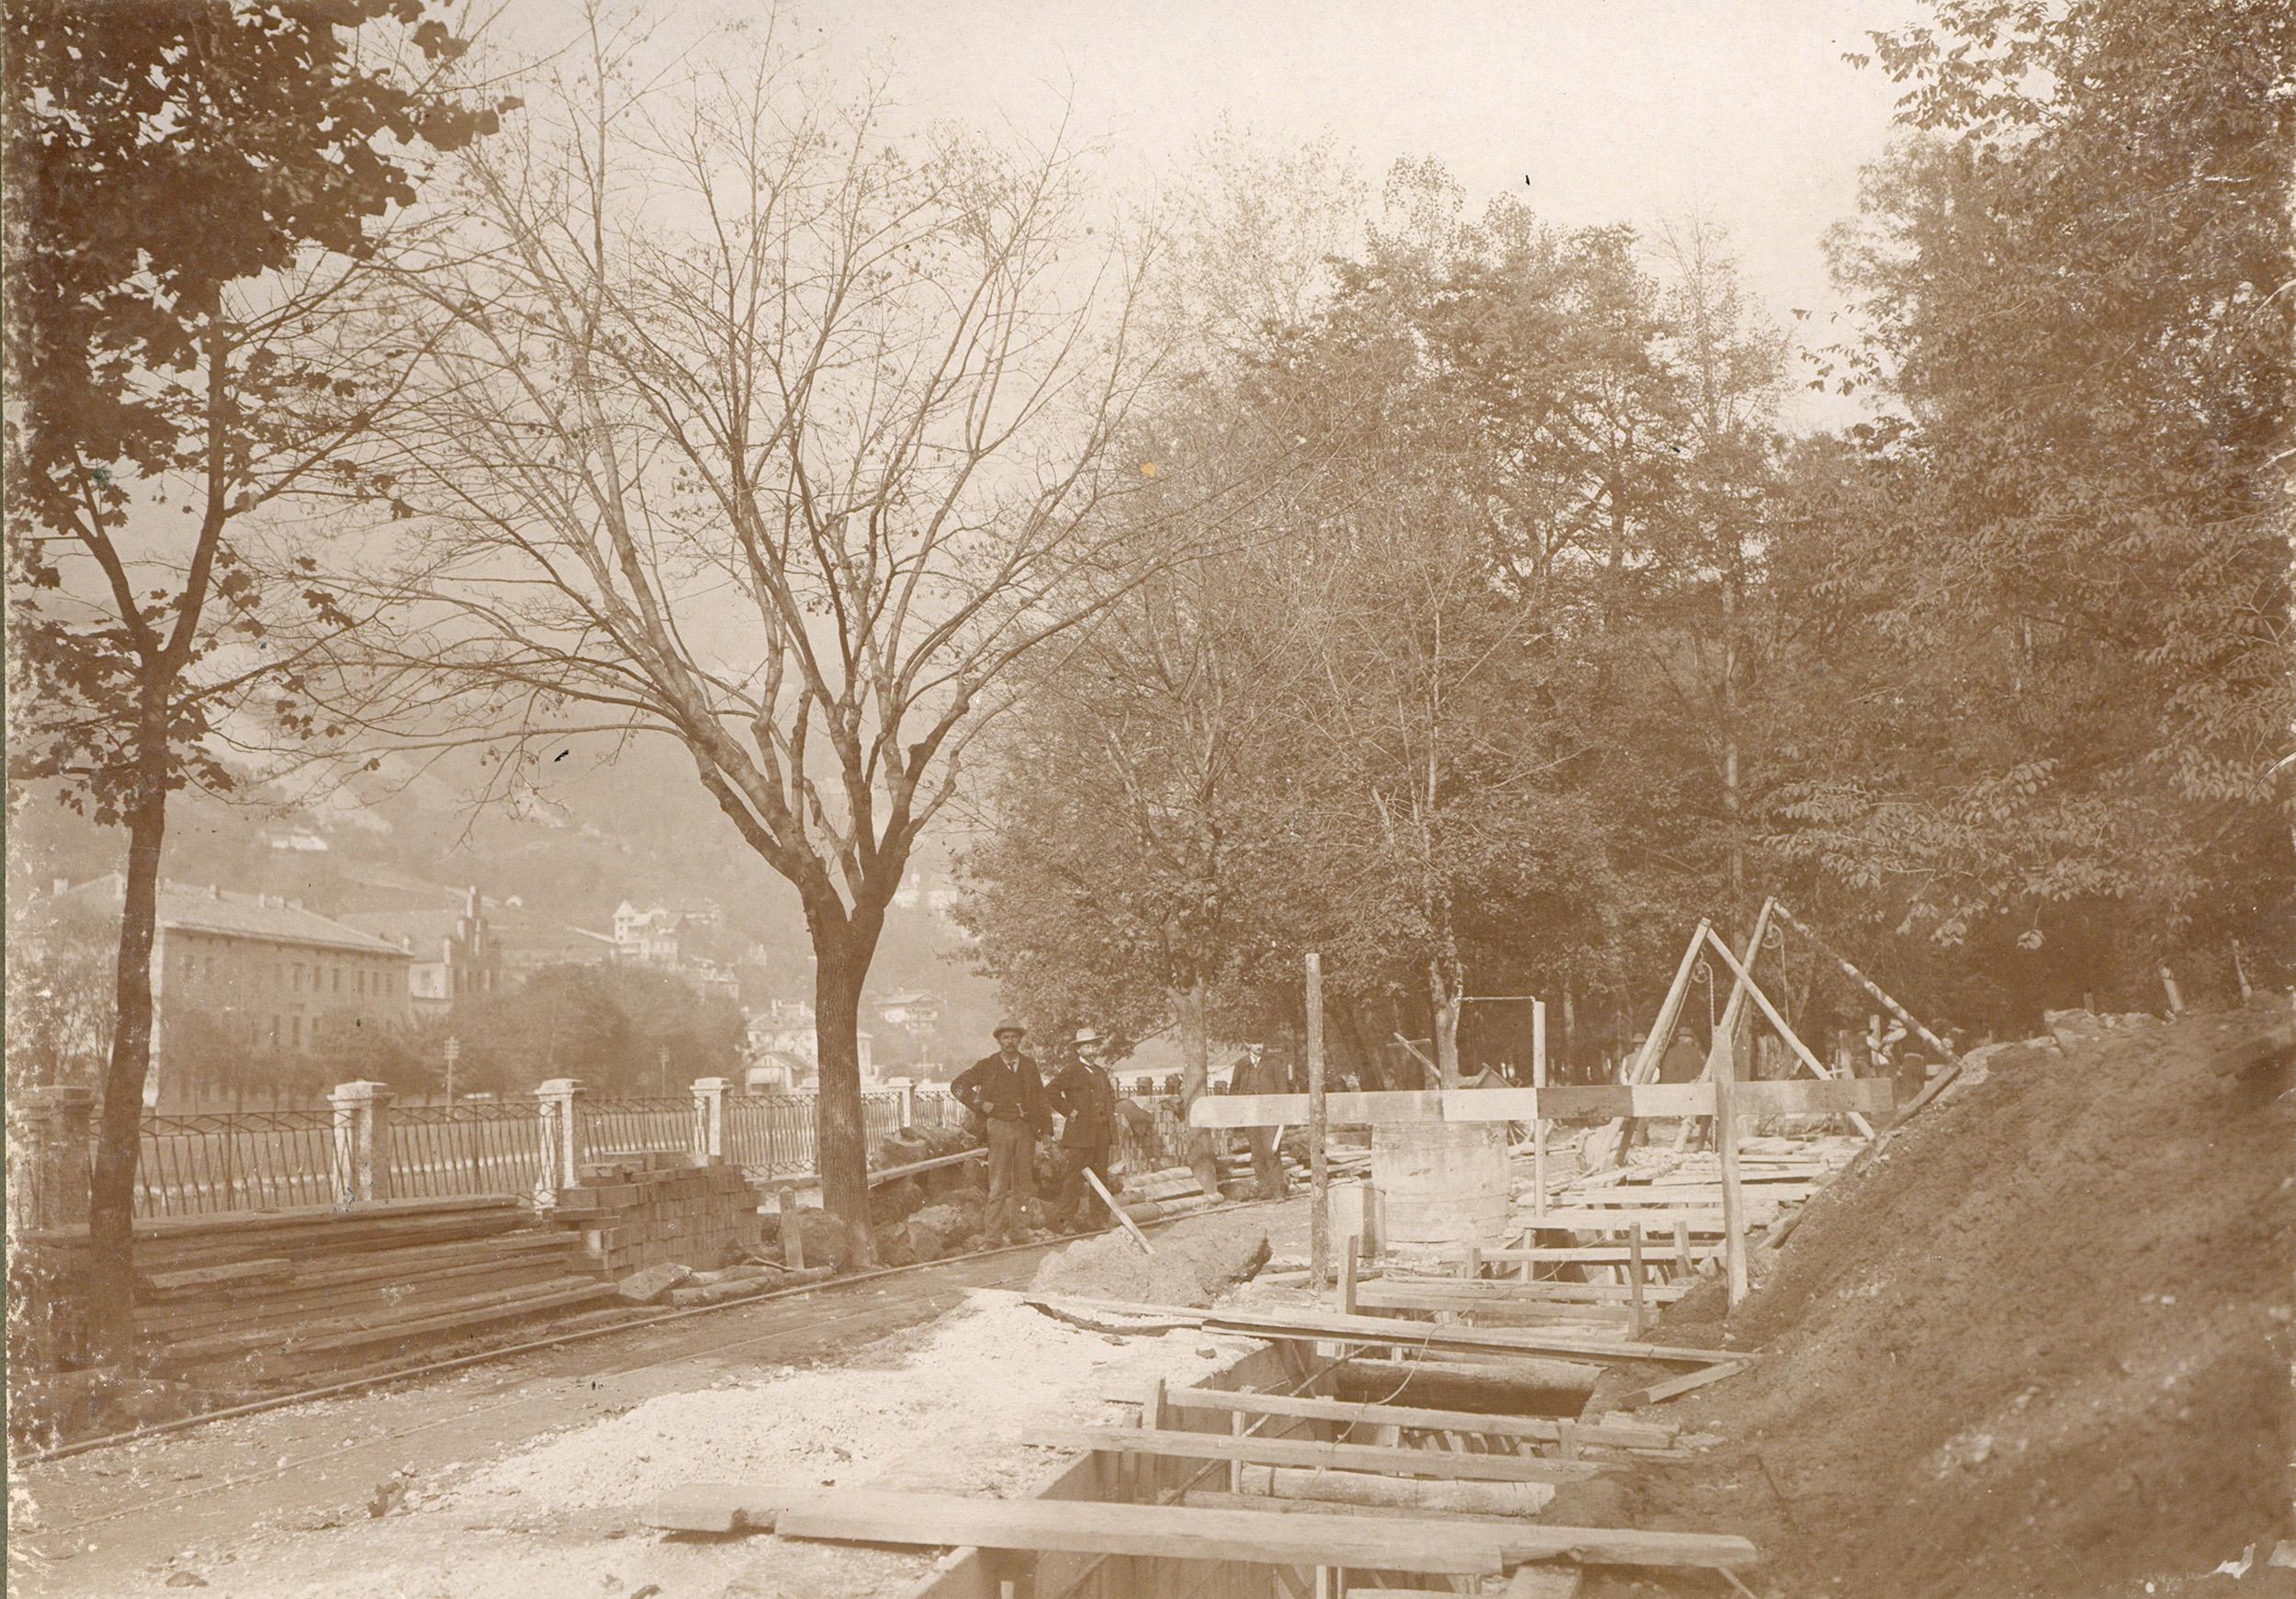 Kanalarbeit Herzog-Otto-Straße